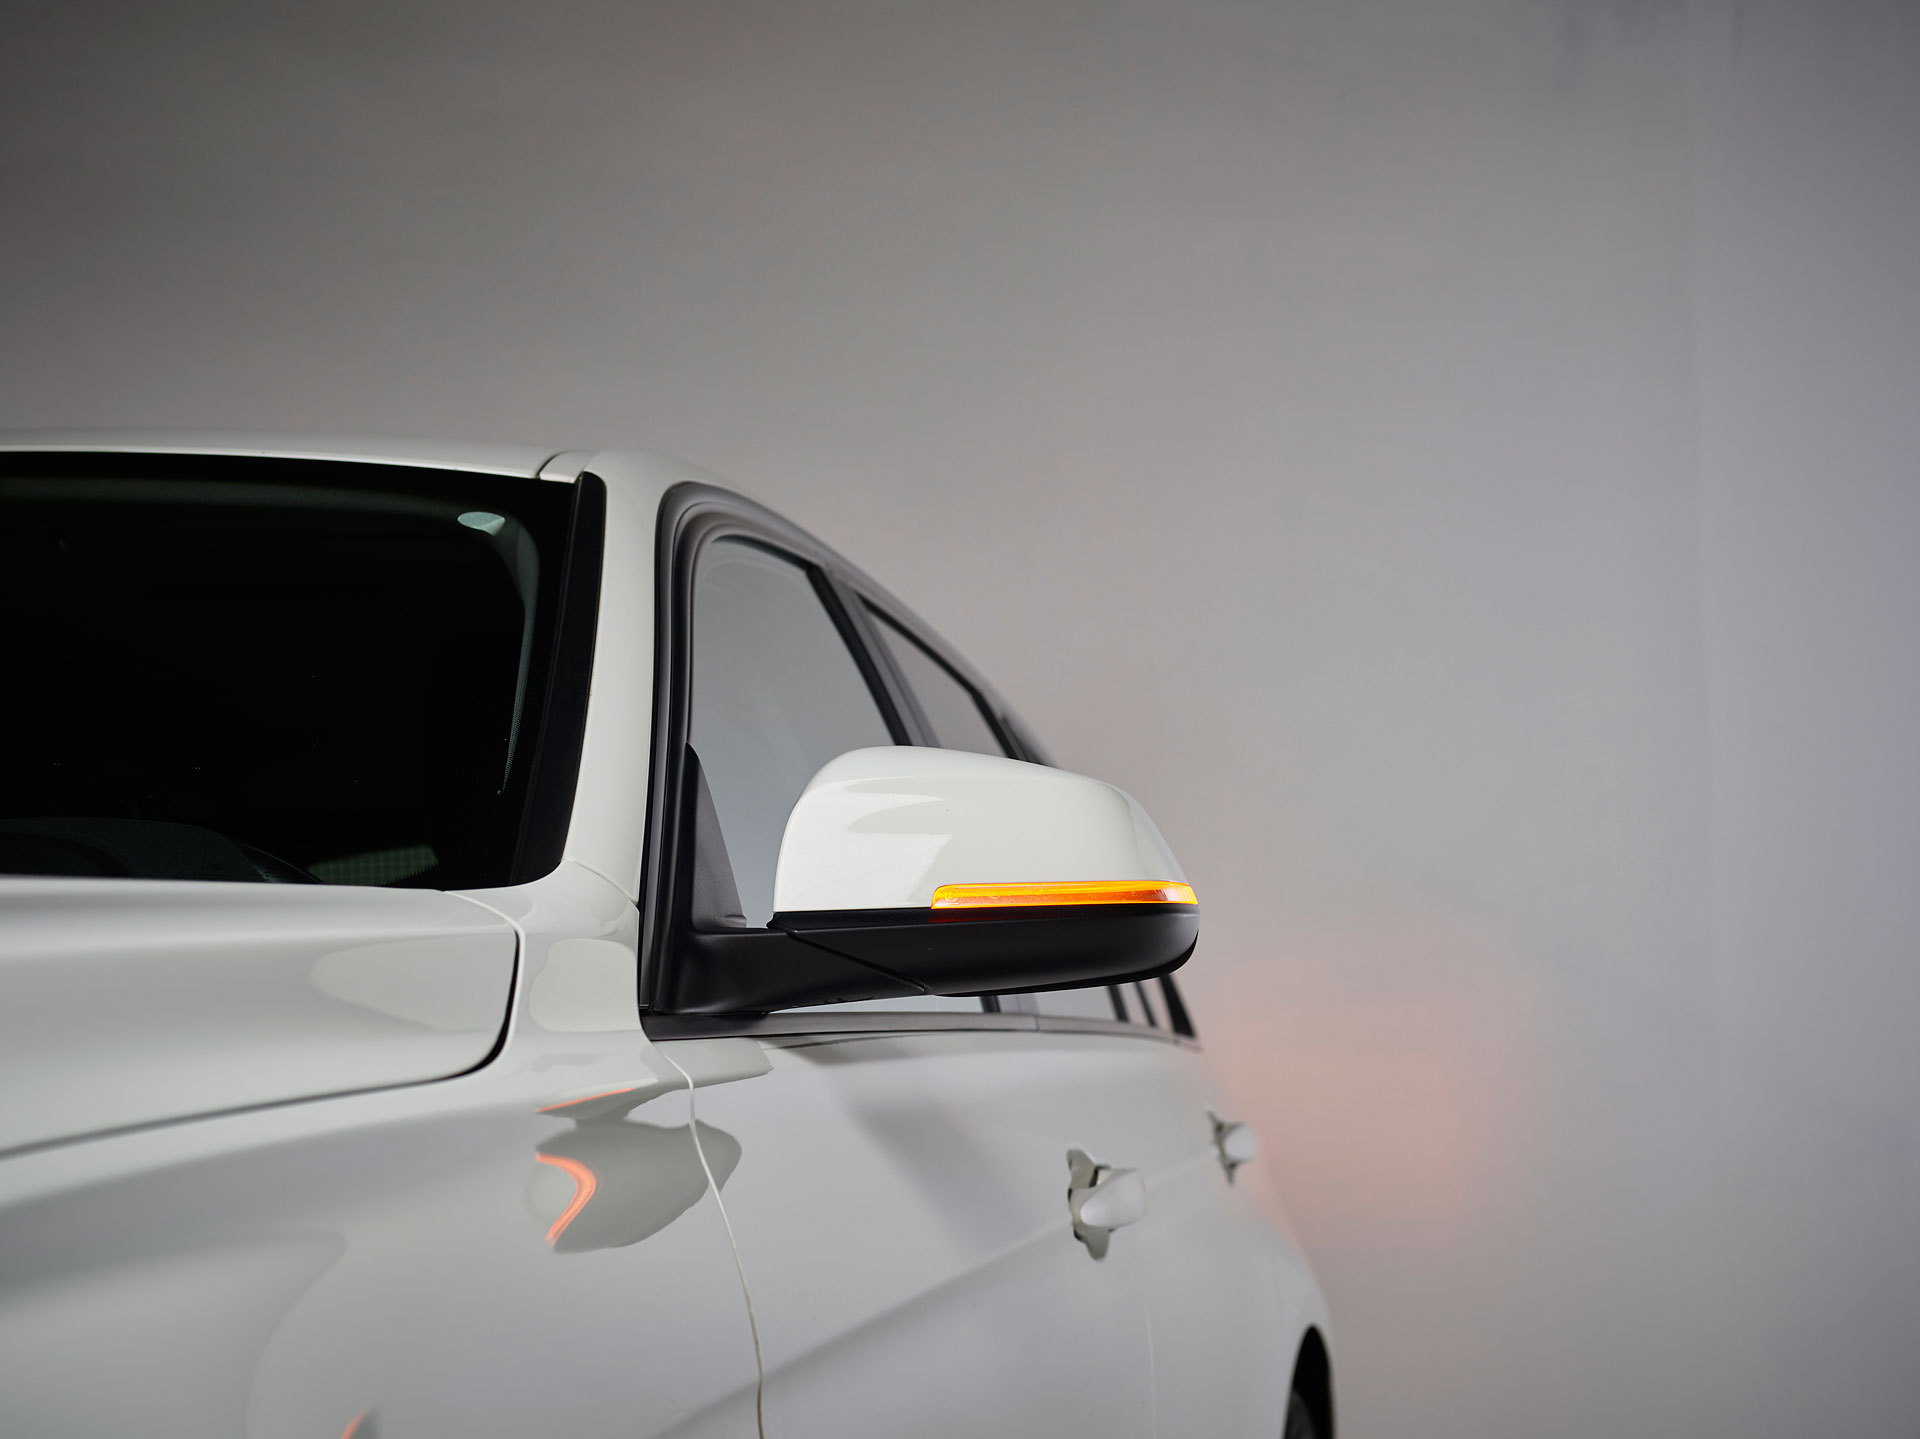 Products Smr Automotive